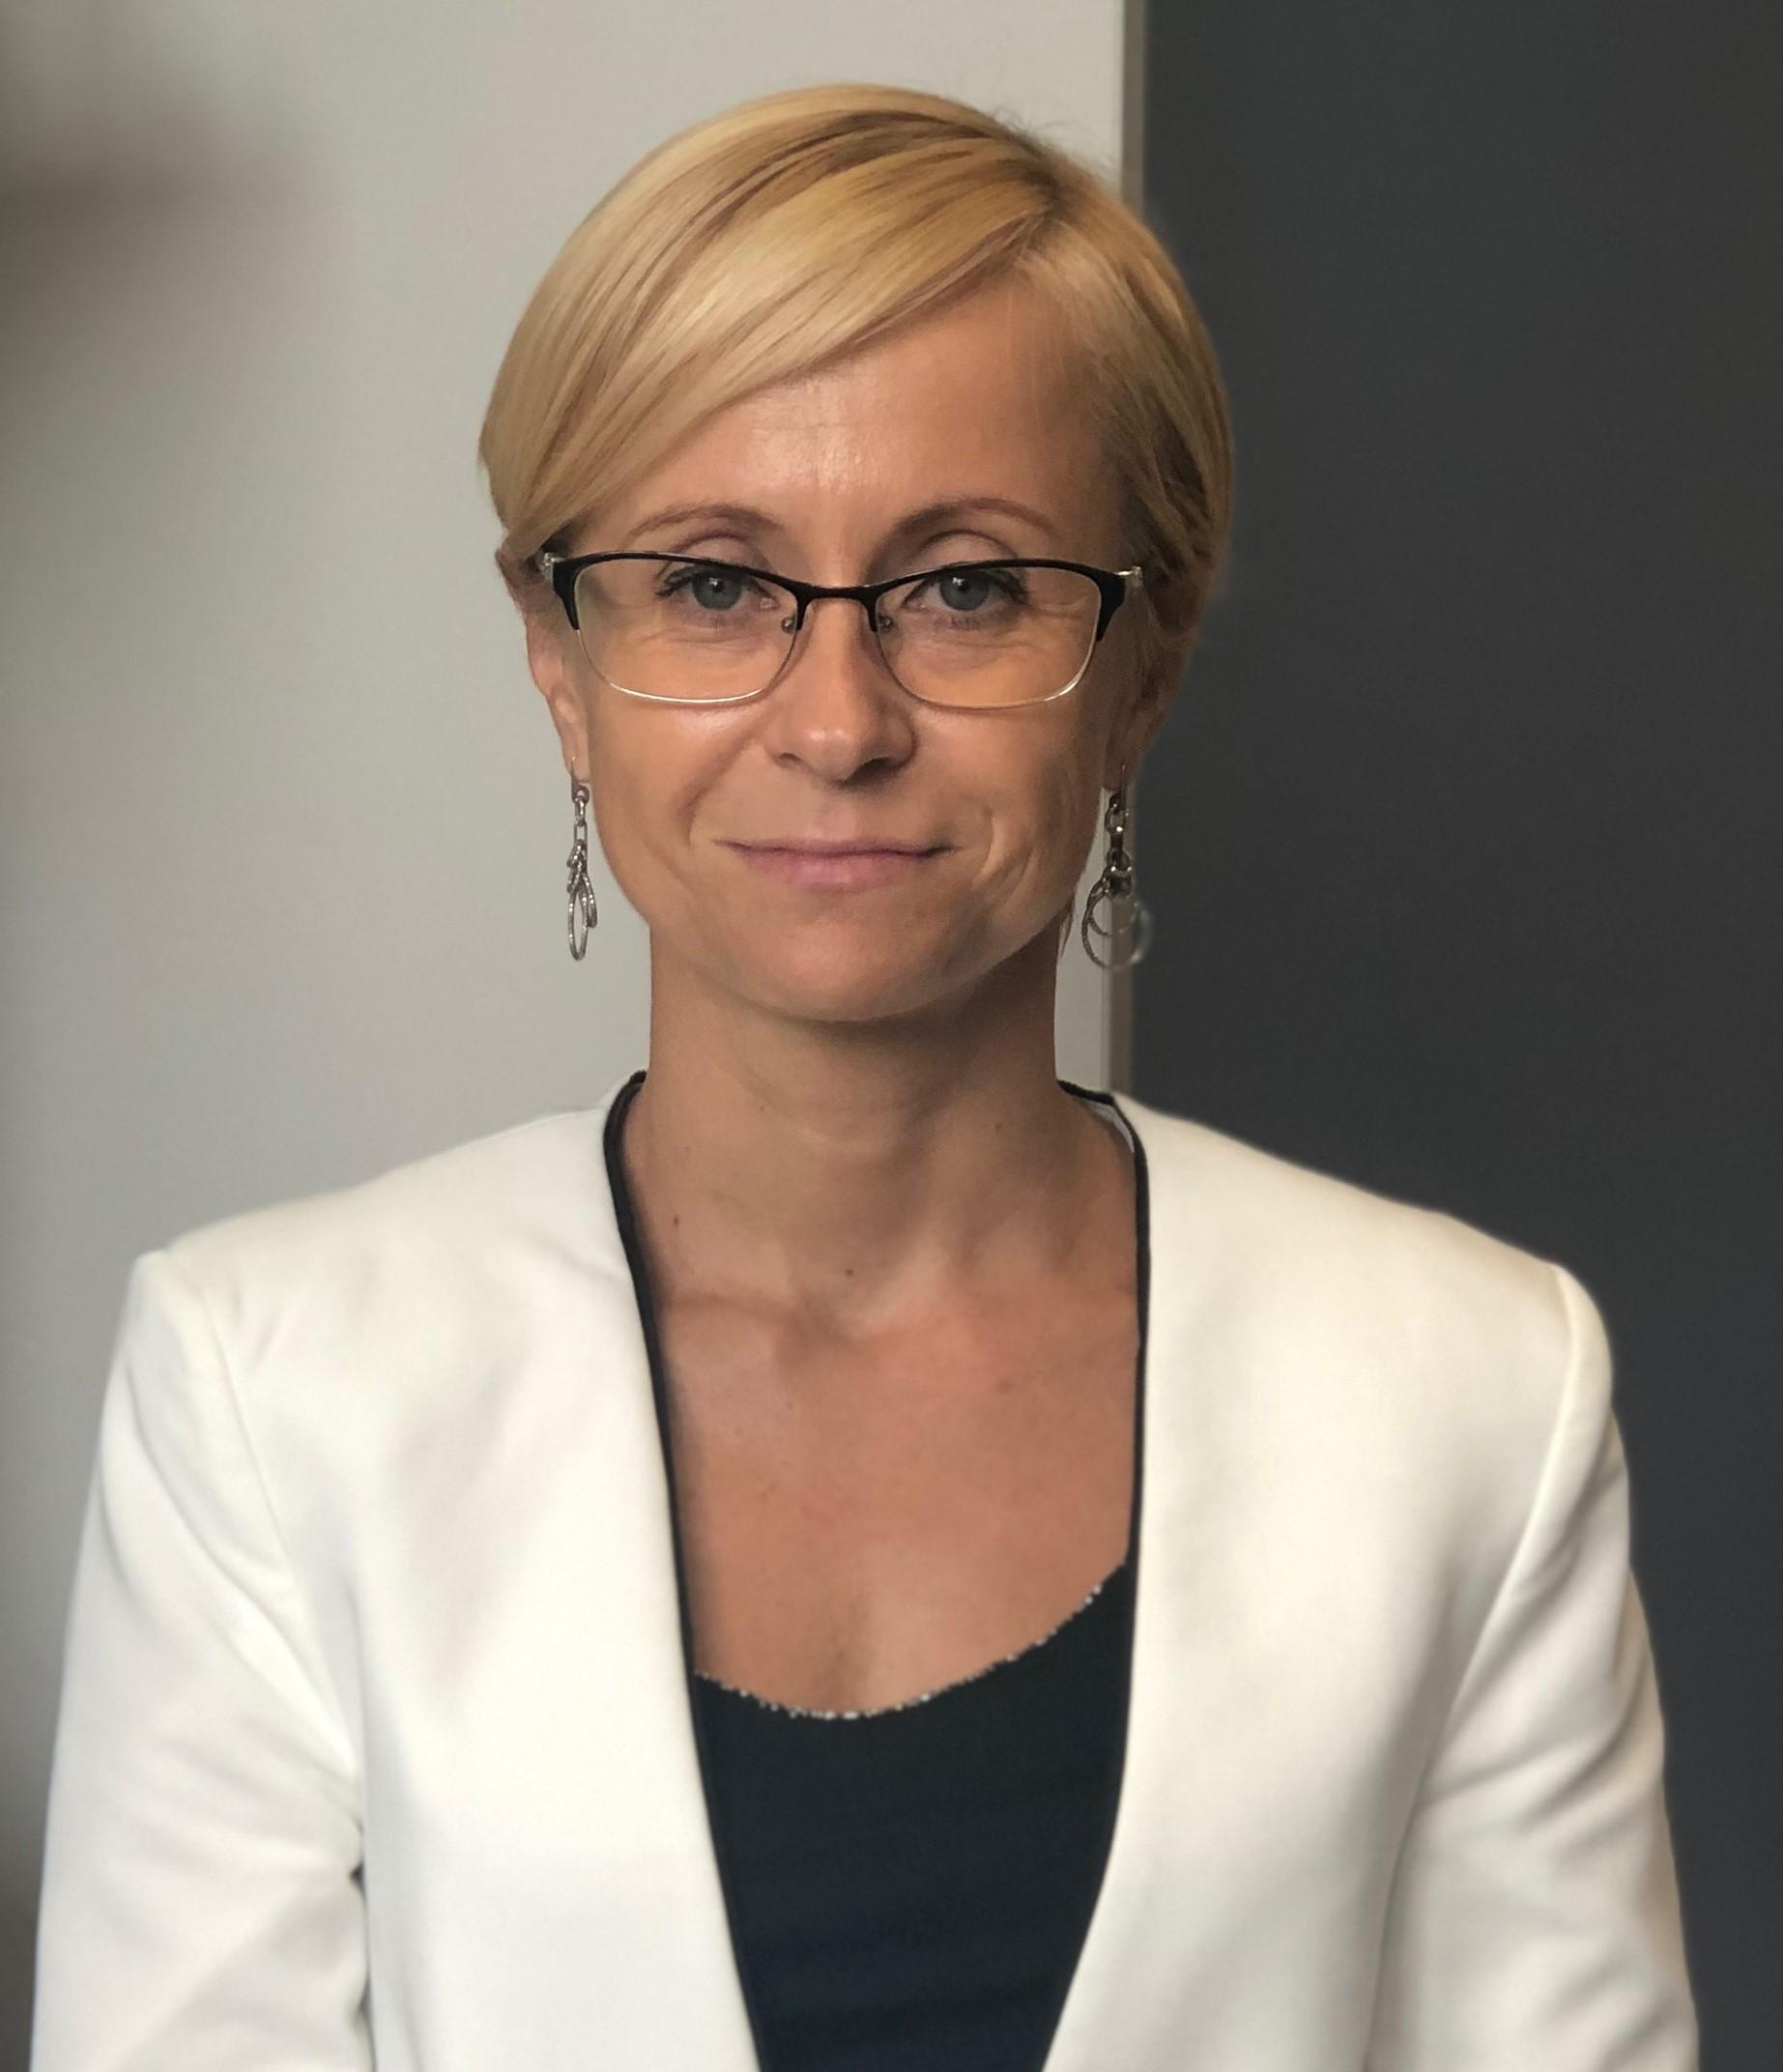 dr hab. RENATA BARCZYŃSKA-FELUSIAK